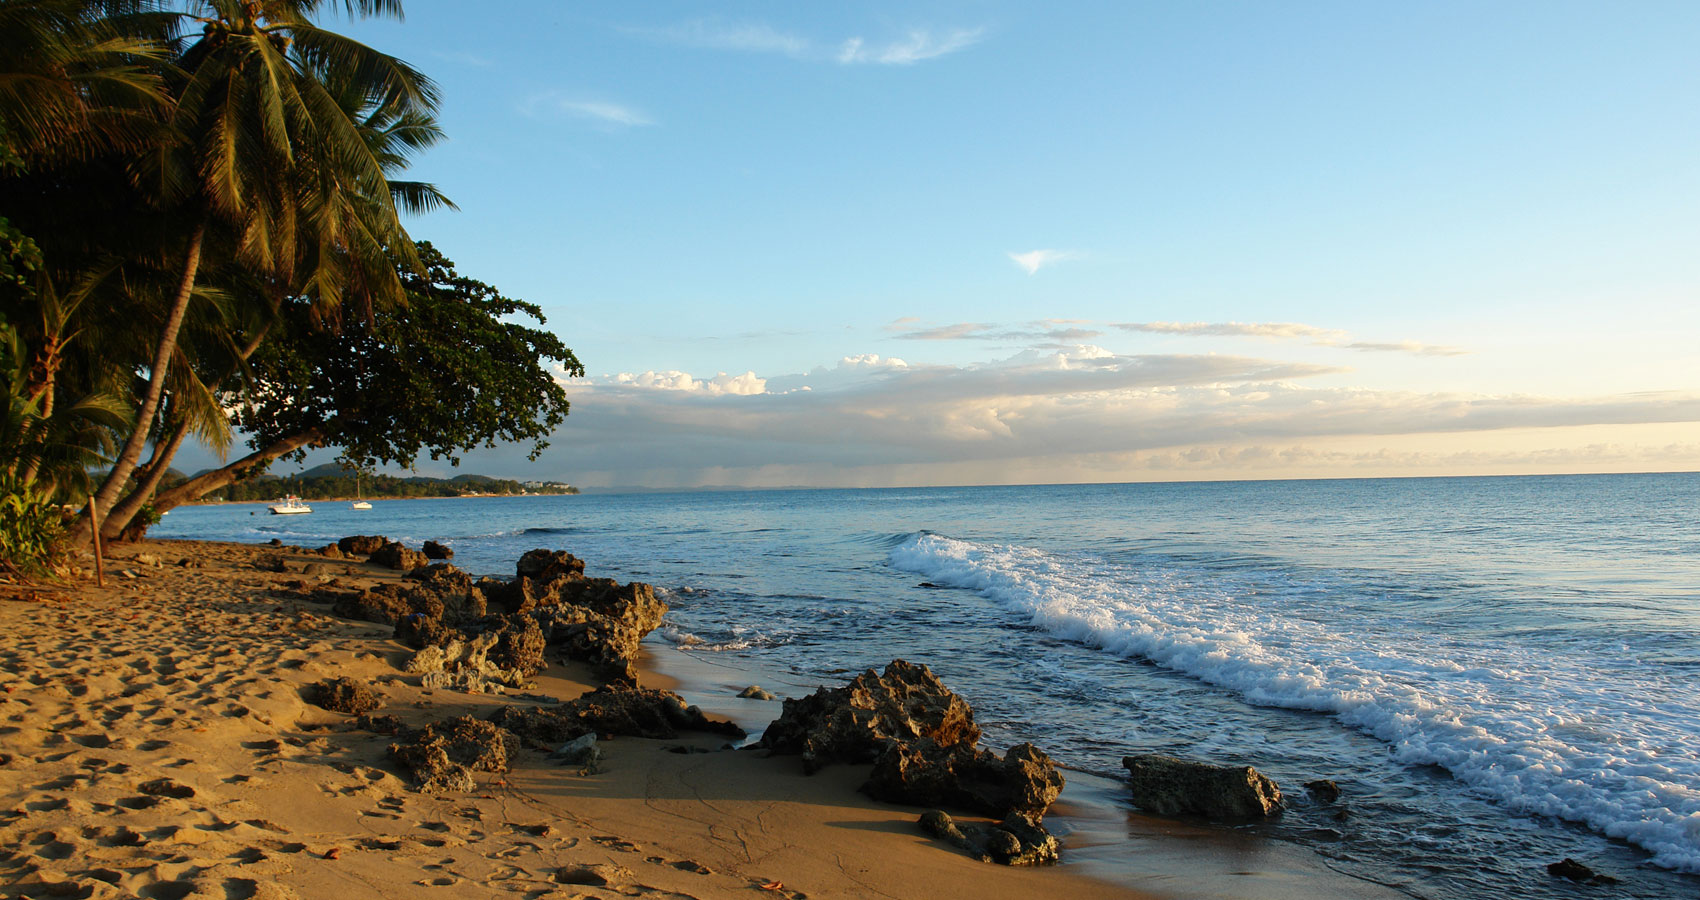 'Canto a Puerto Rico' Mi Borinquén by José A. Gómez at Spillwords.com